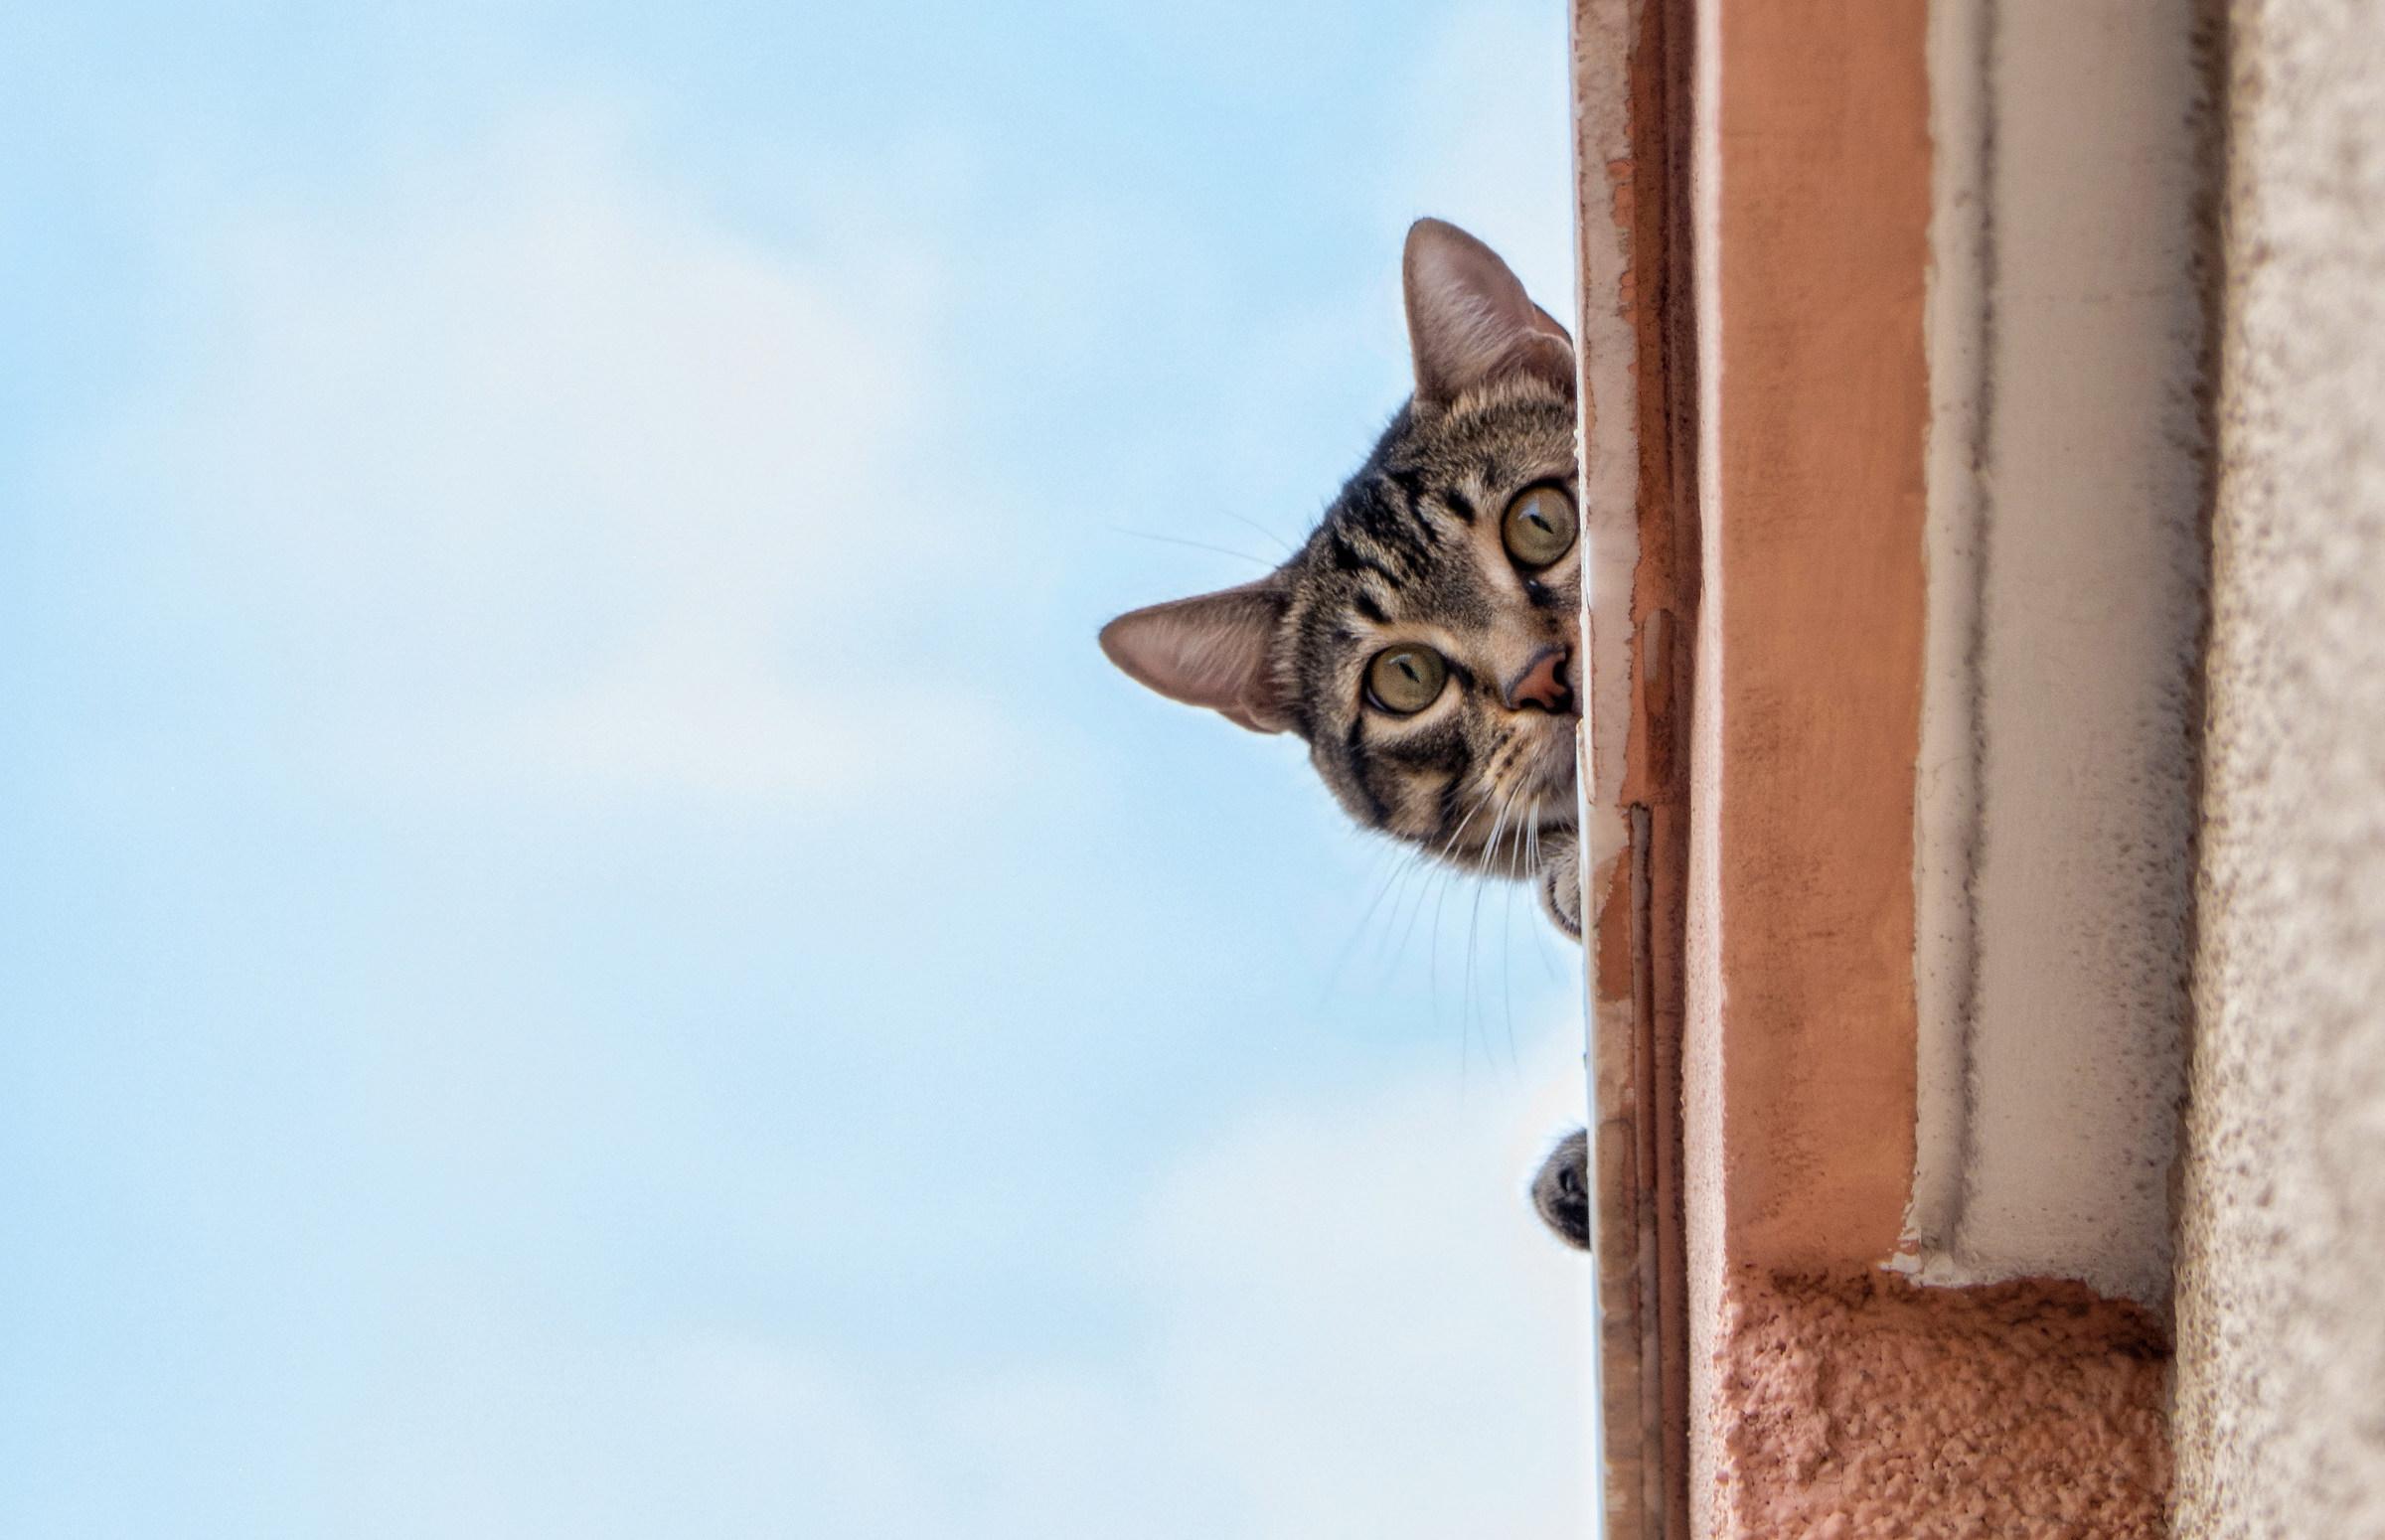 The upstairs neighbor...